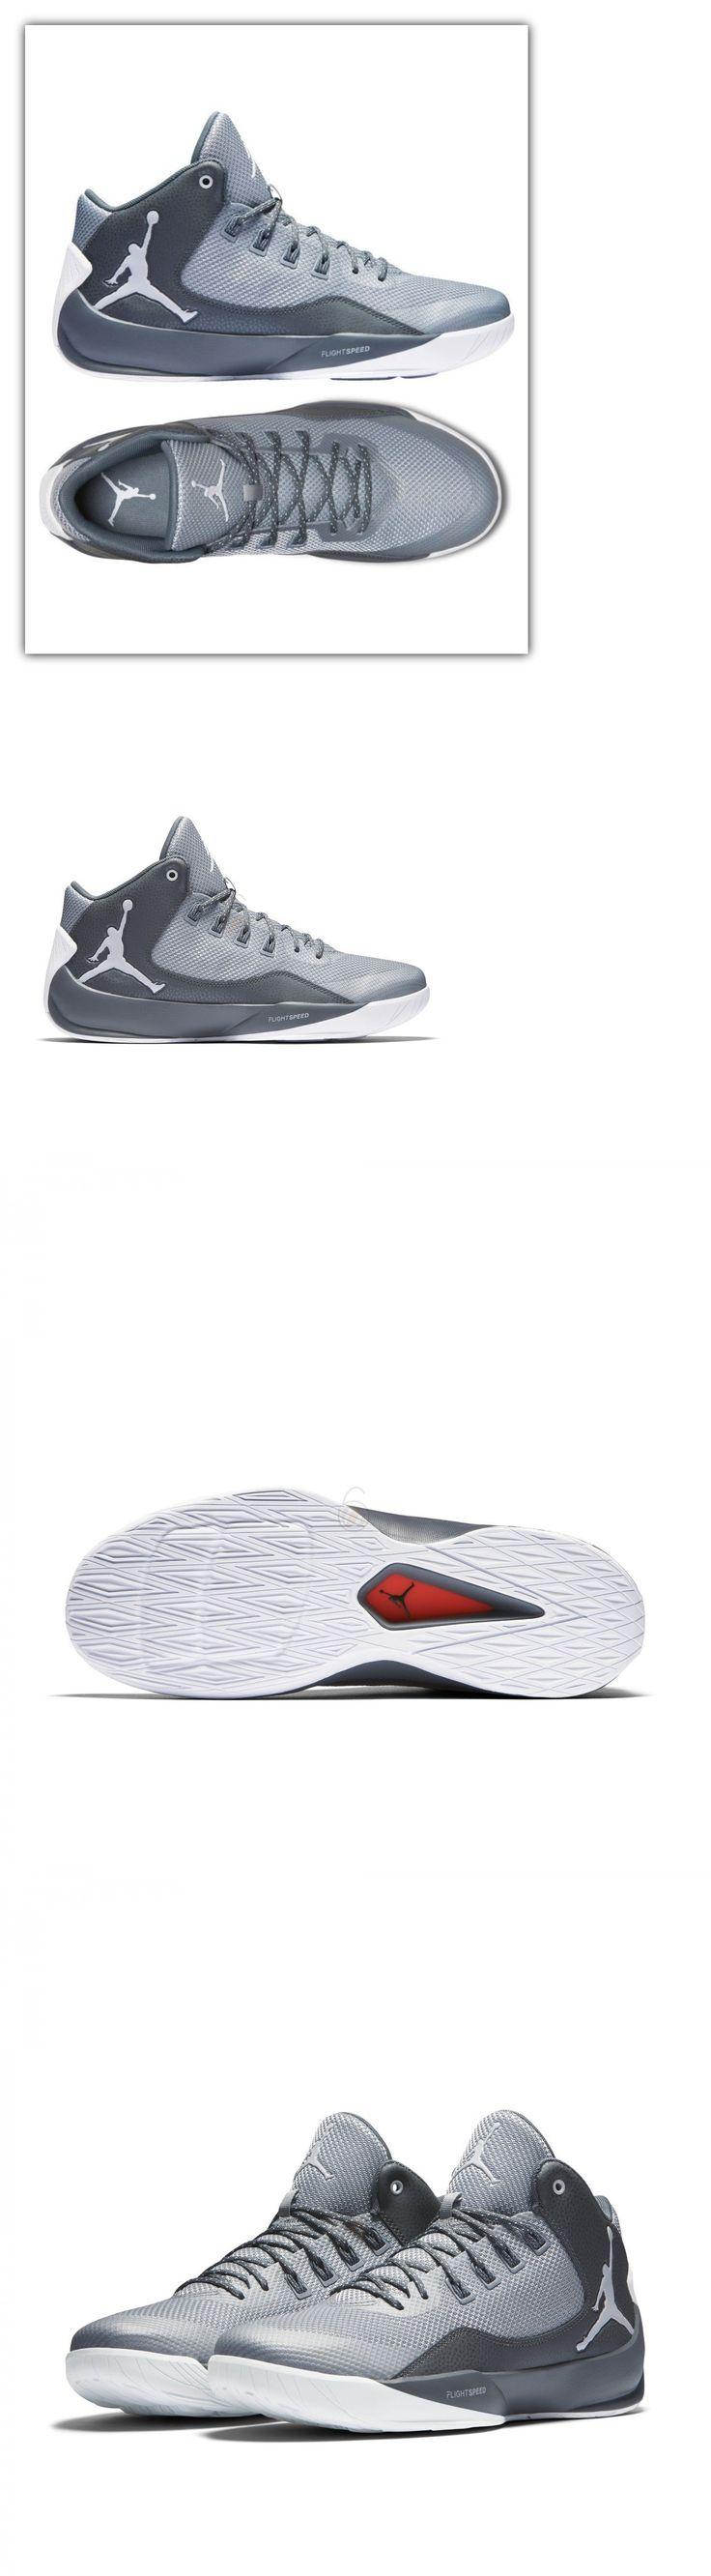 Basketball: Mens Nike Air Jordan Shoes Grey Nike Jordan Rising High 2 Basketball Shoes New -> BUY IT NOW ONLY: $98.95 on eBay!